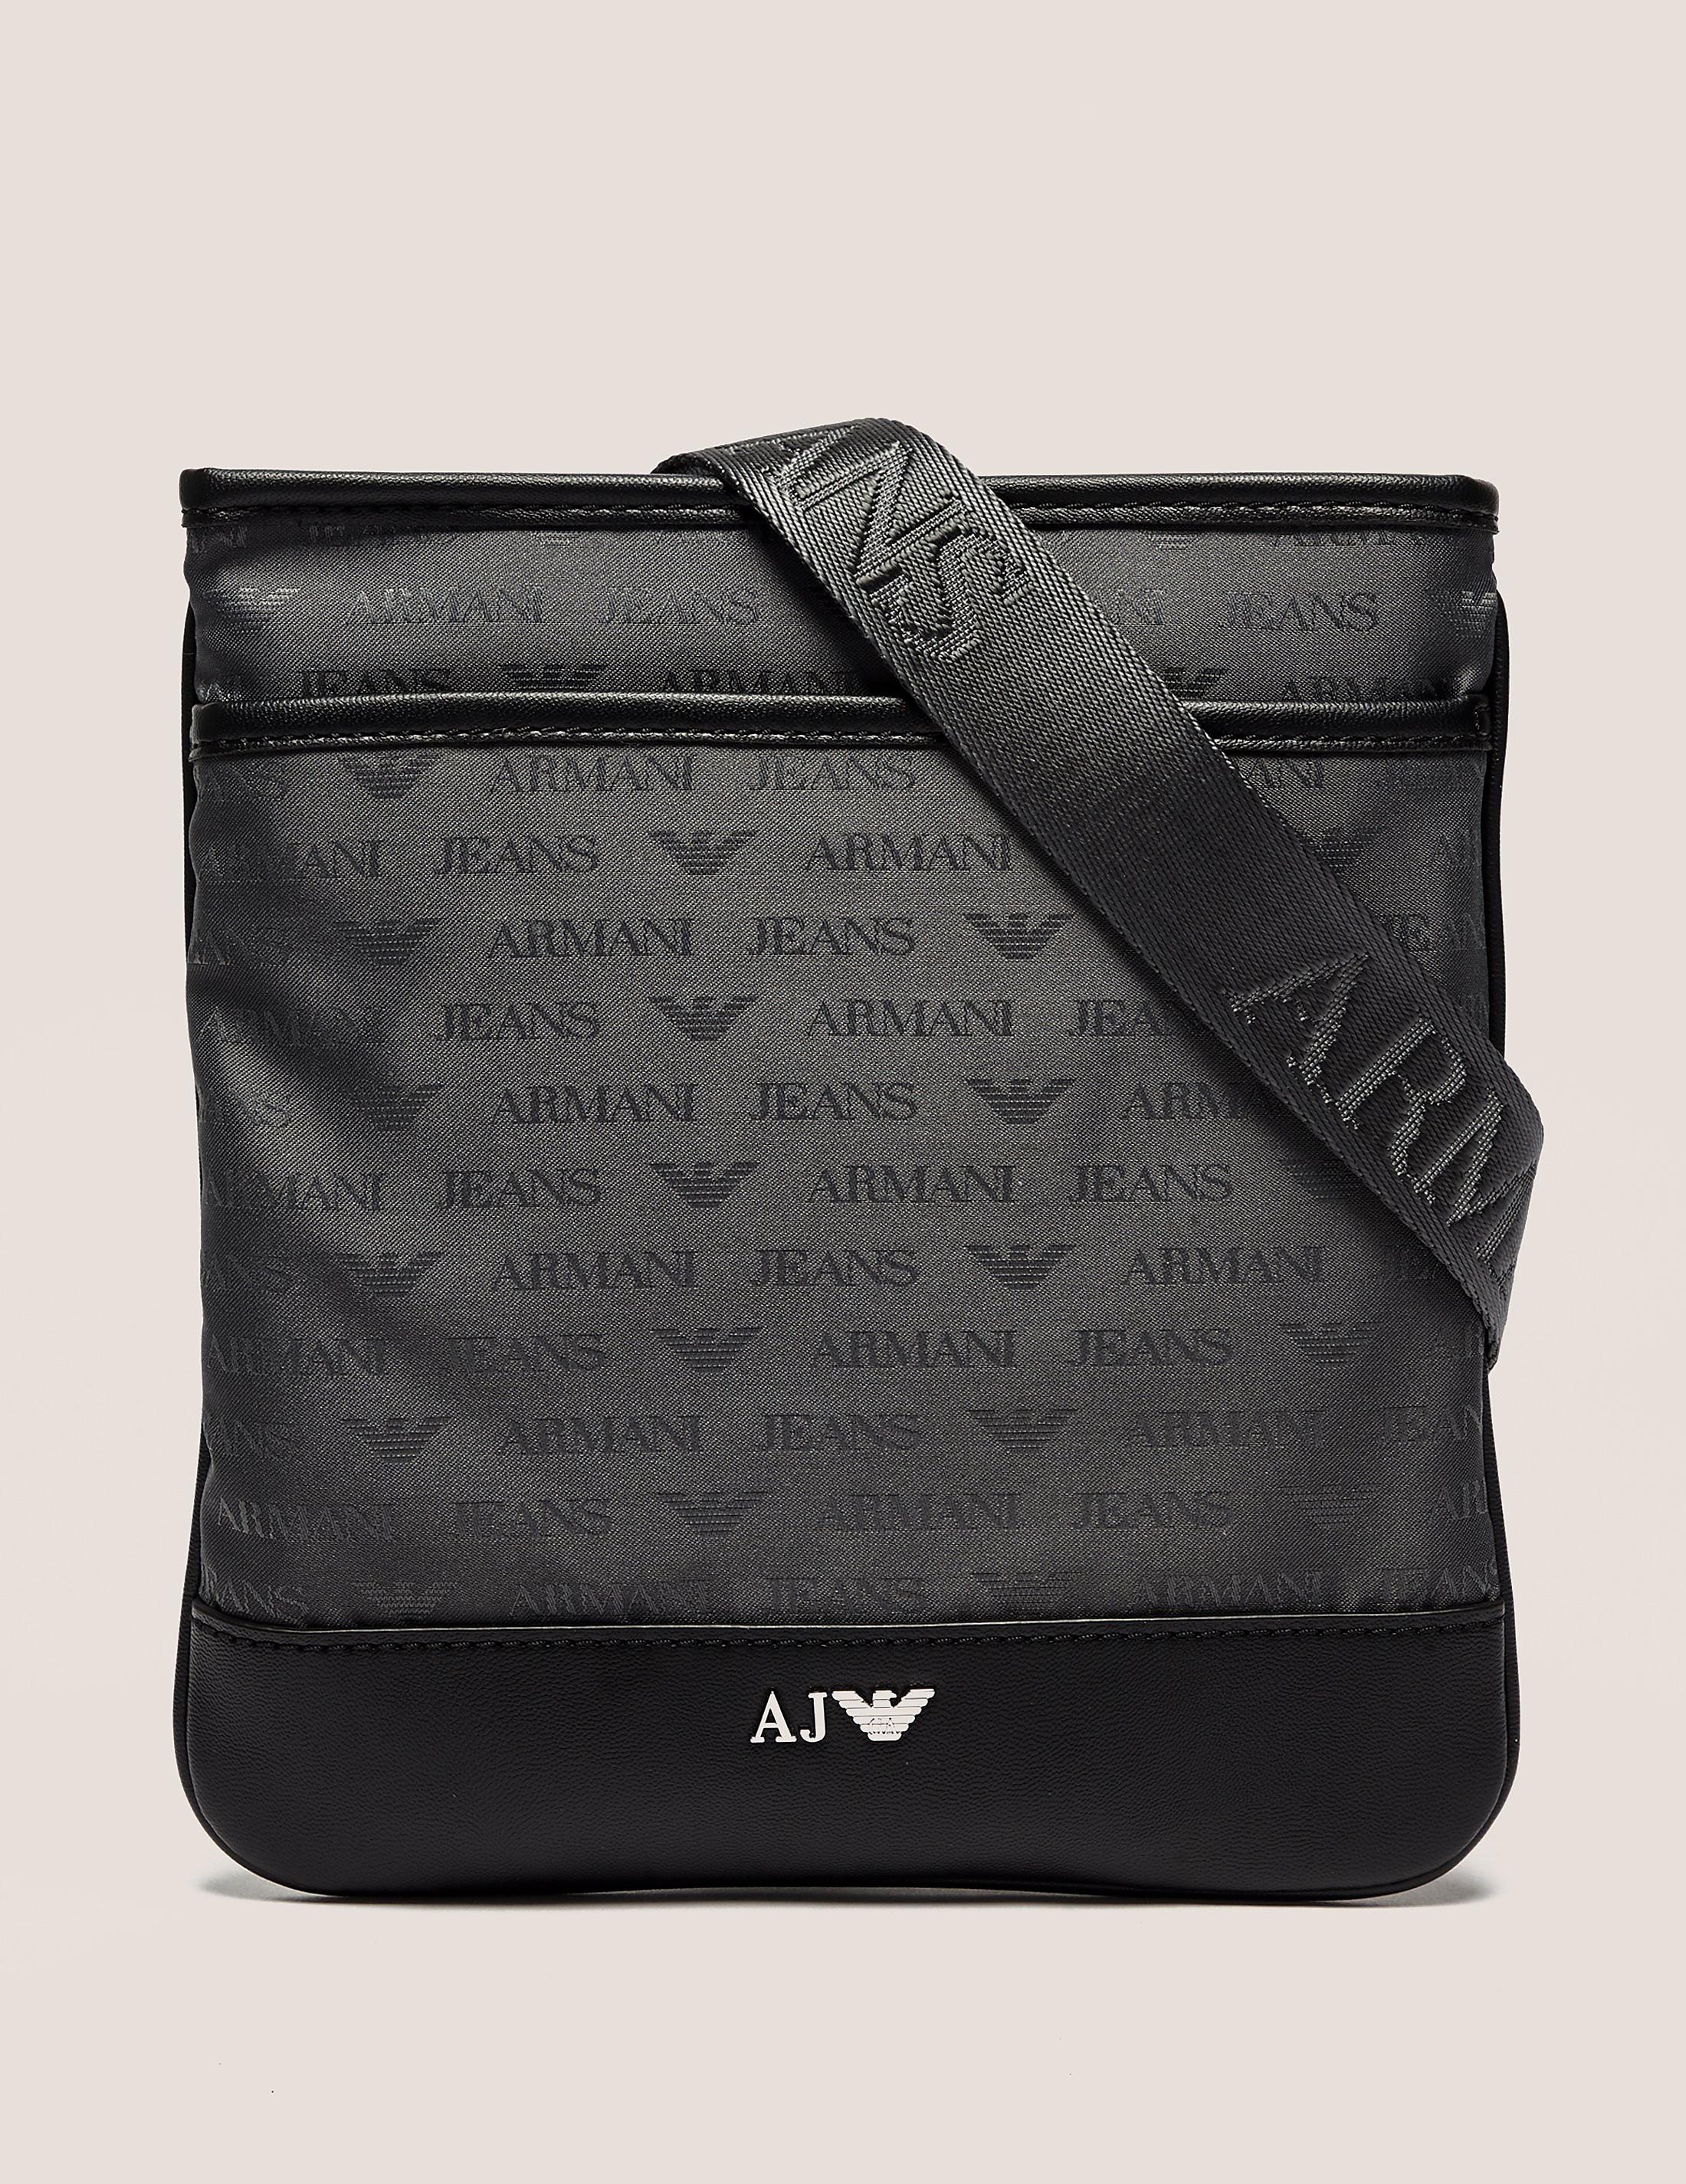 Armani Jeans Small Bag